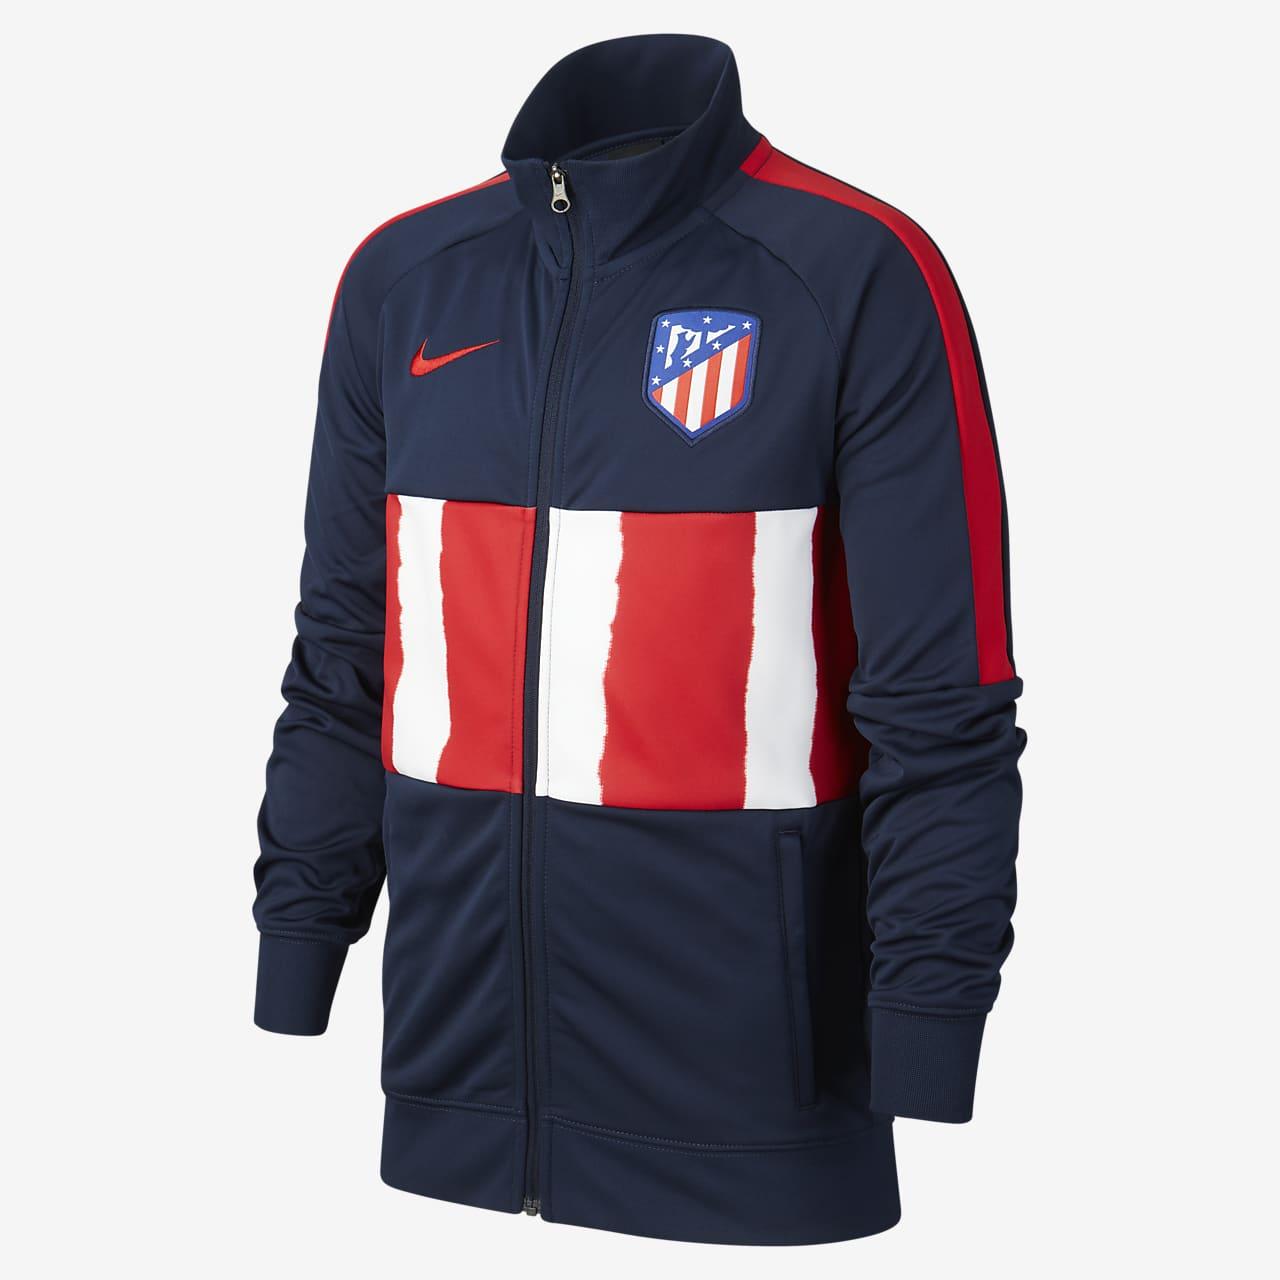 Atlético de Madrid Older Kids' Football Tracksuit Jacket